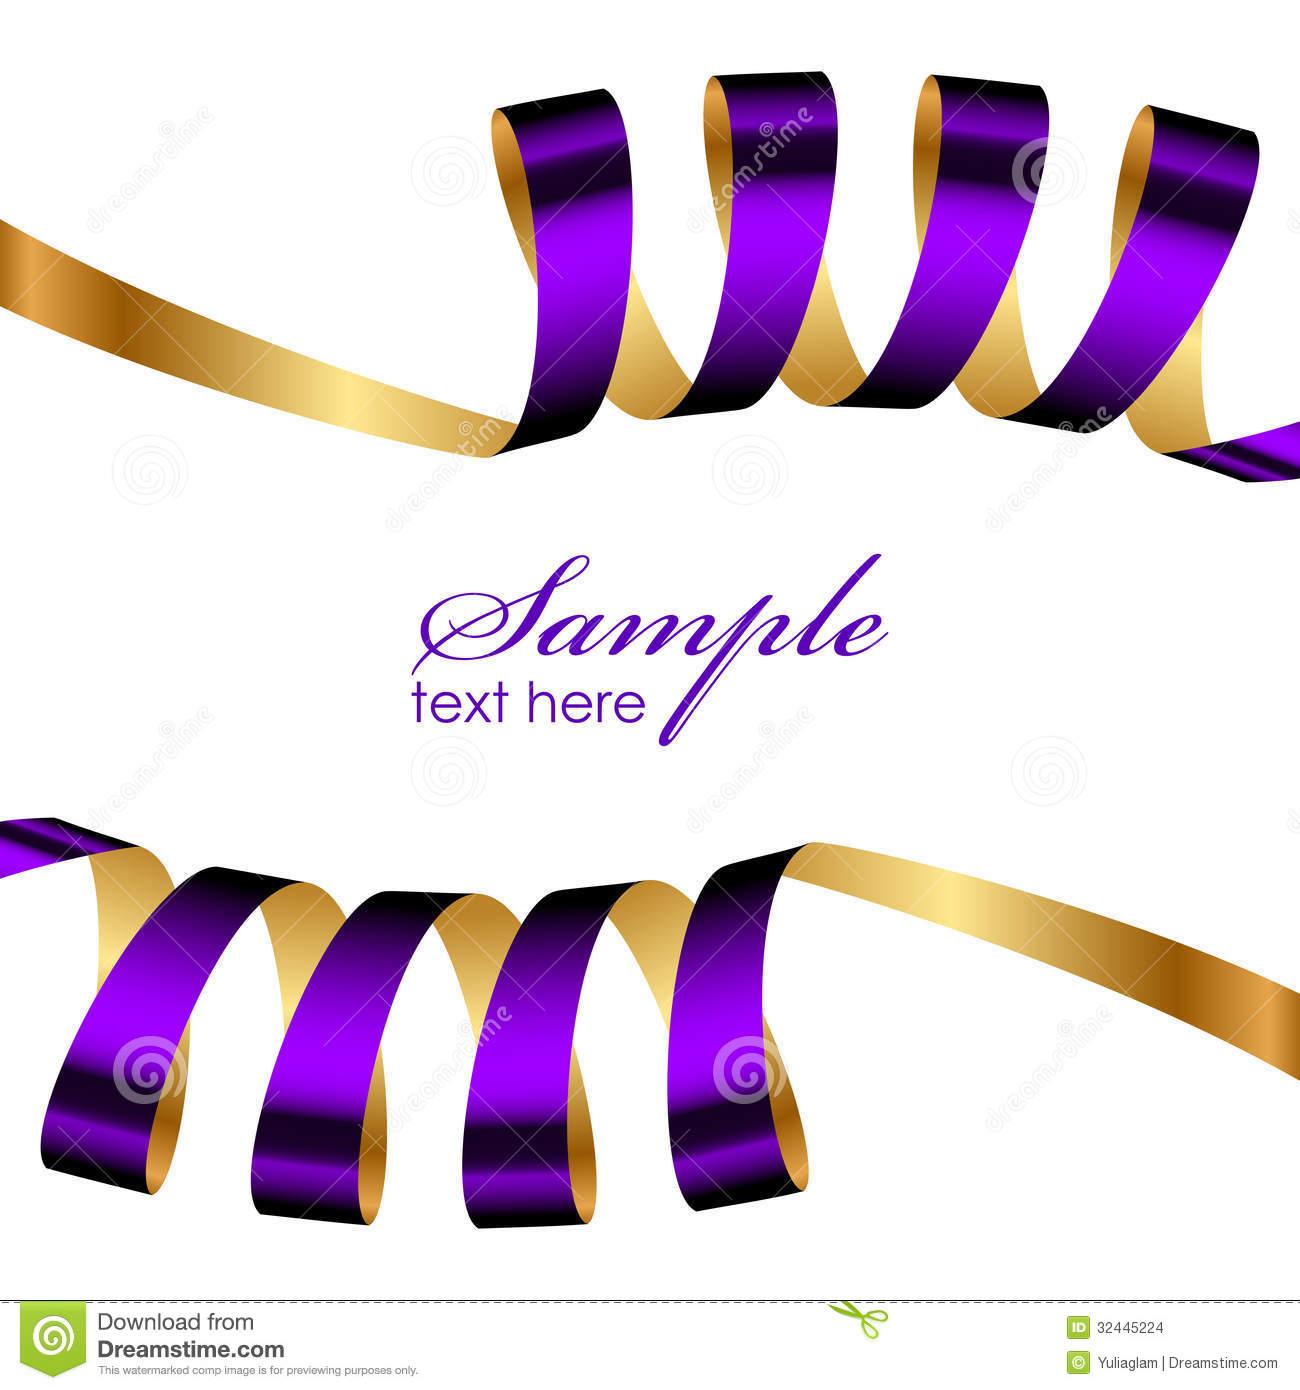 Post_purple And Gold Vector Frames Png_246856 on Violet Border Clip Art